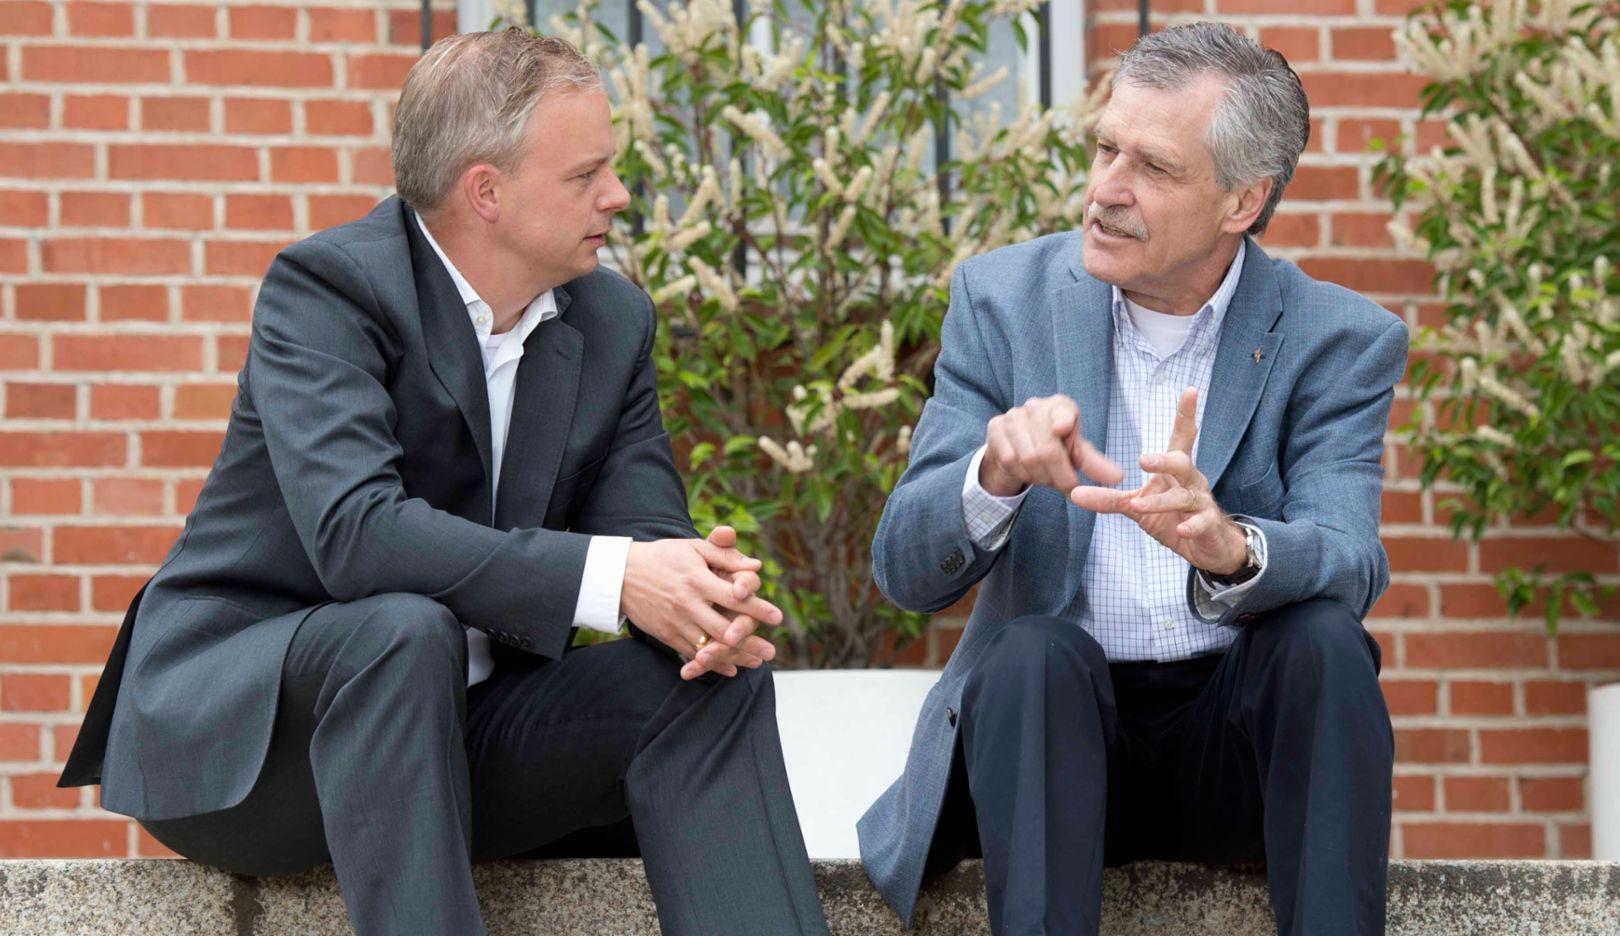 l-r, Arne Petersen, Porsche consultant;Norbert Majerus, Goodyear-Manager;2016, Porsche Consulting GmbH